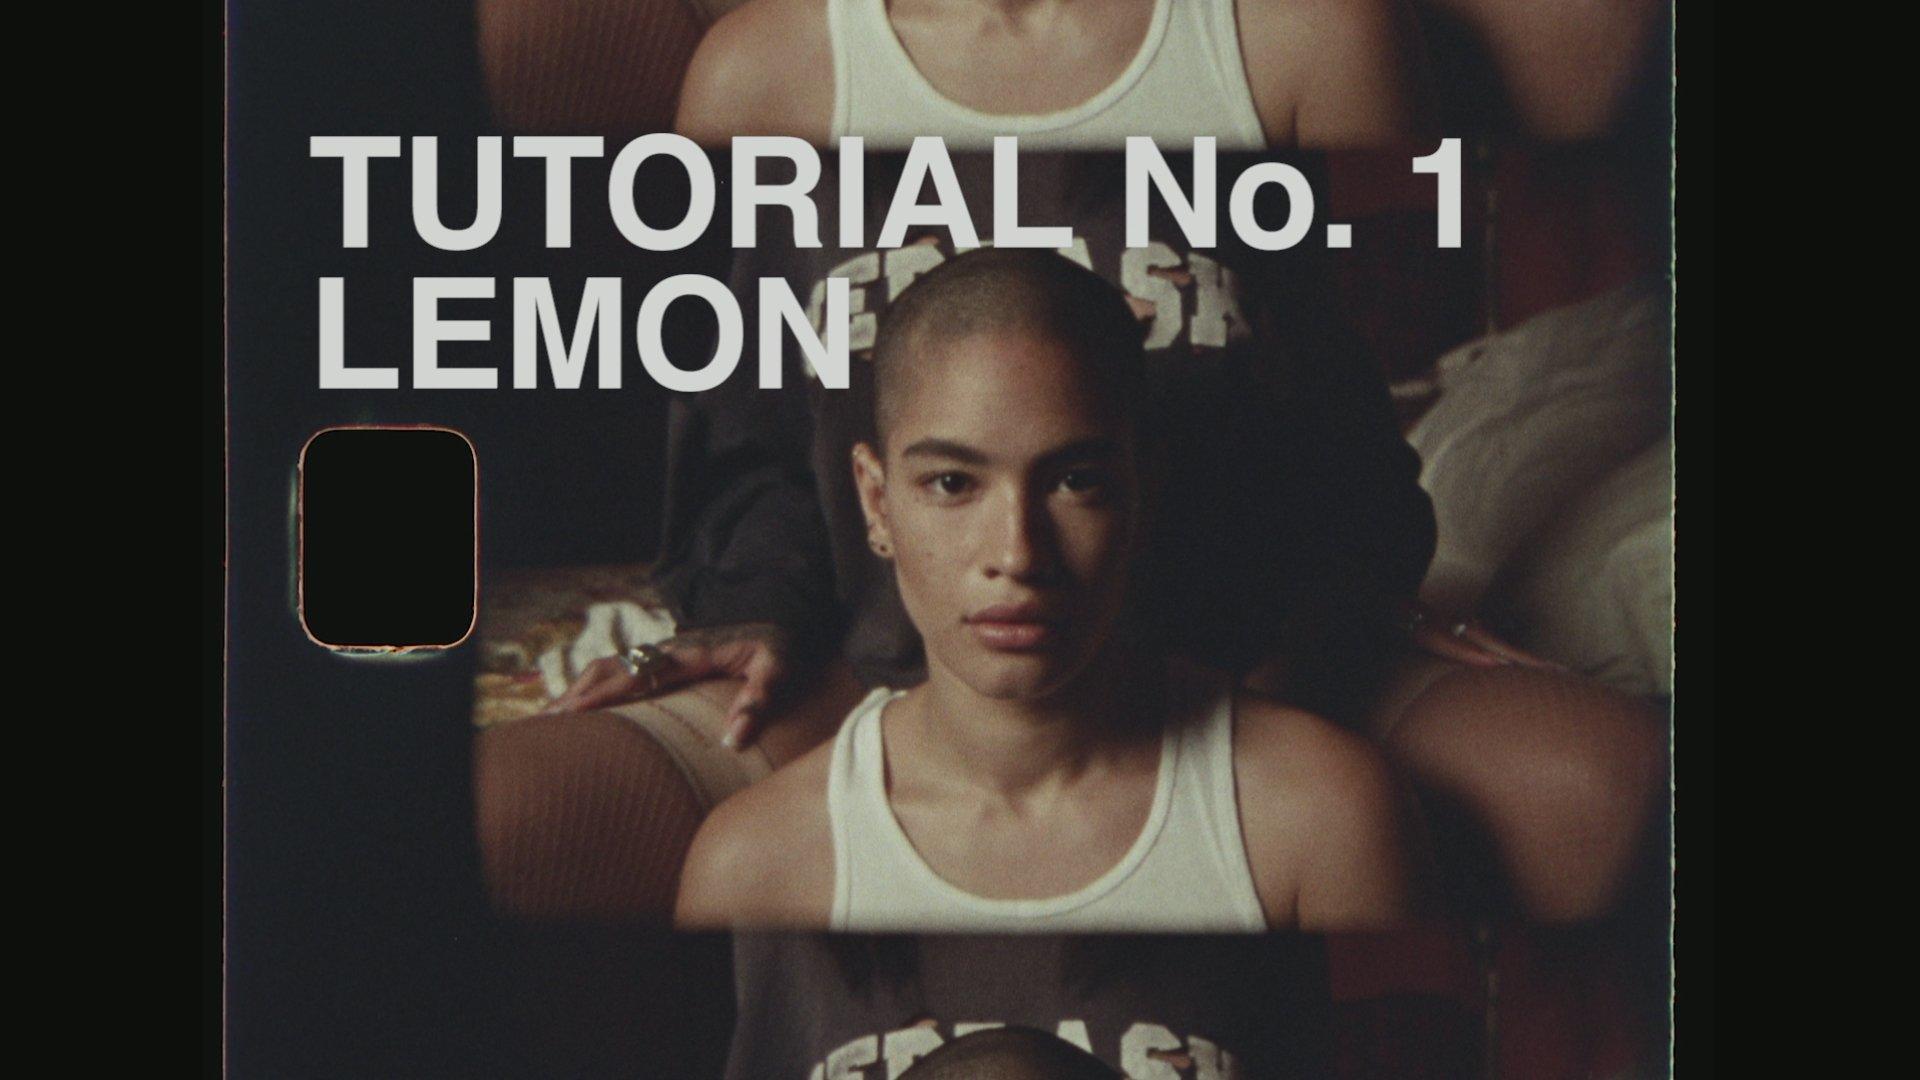 rihanna nerd lemon